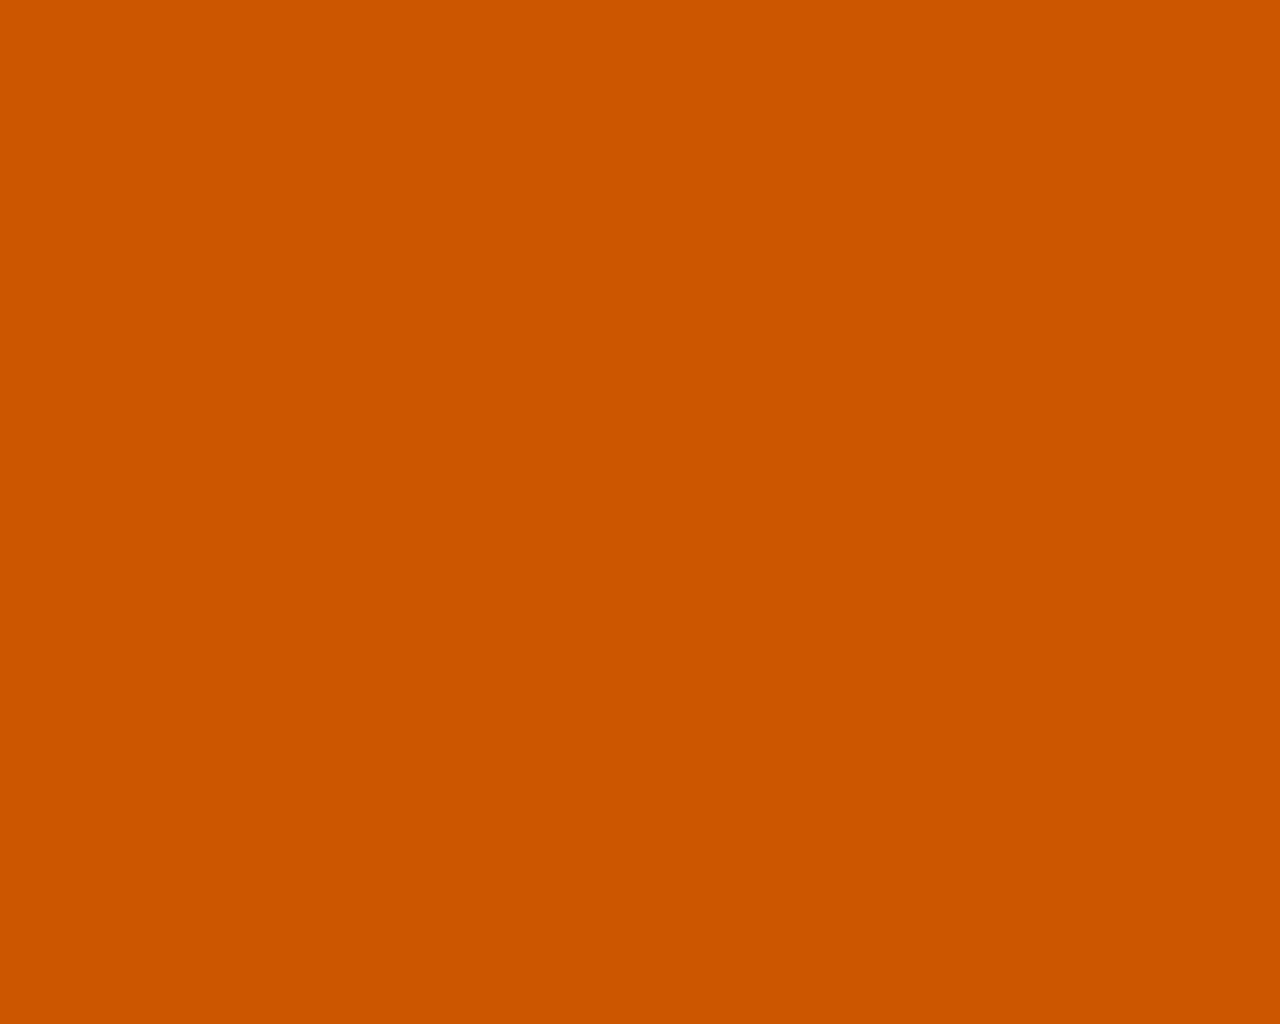 Orange Colored Stool Dogs